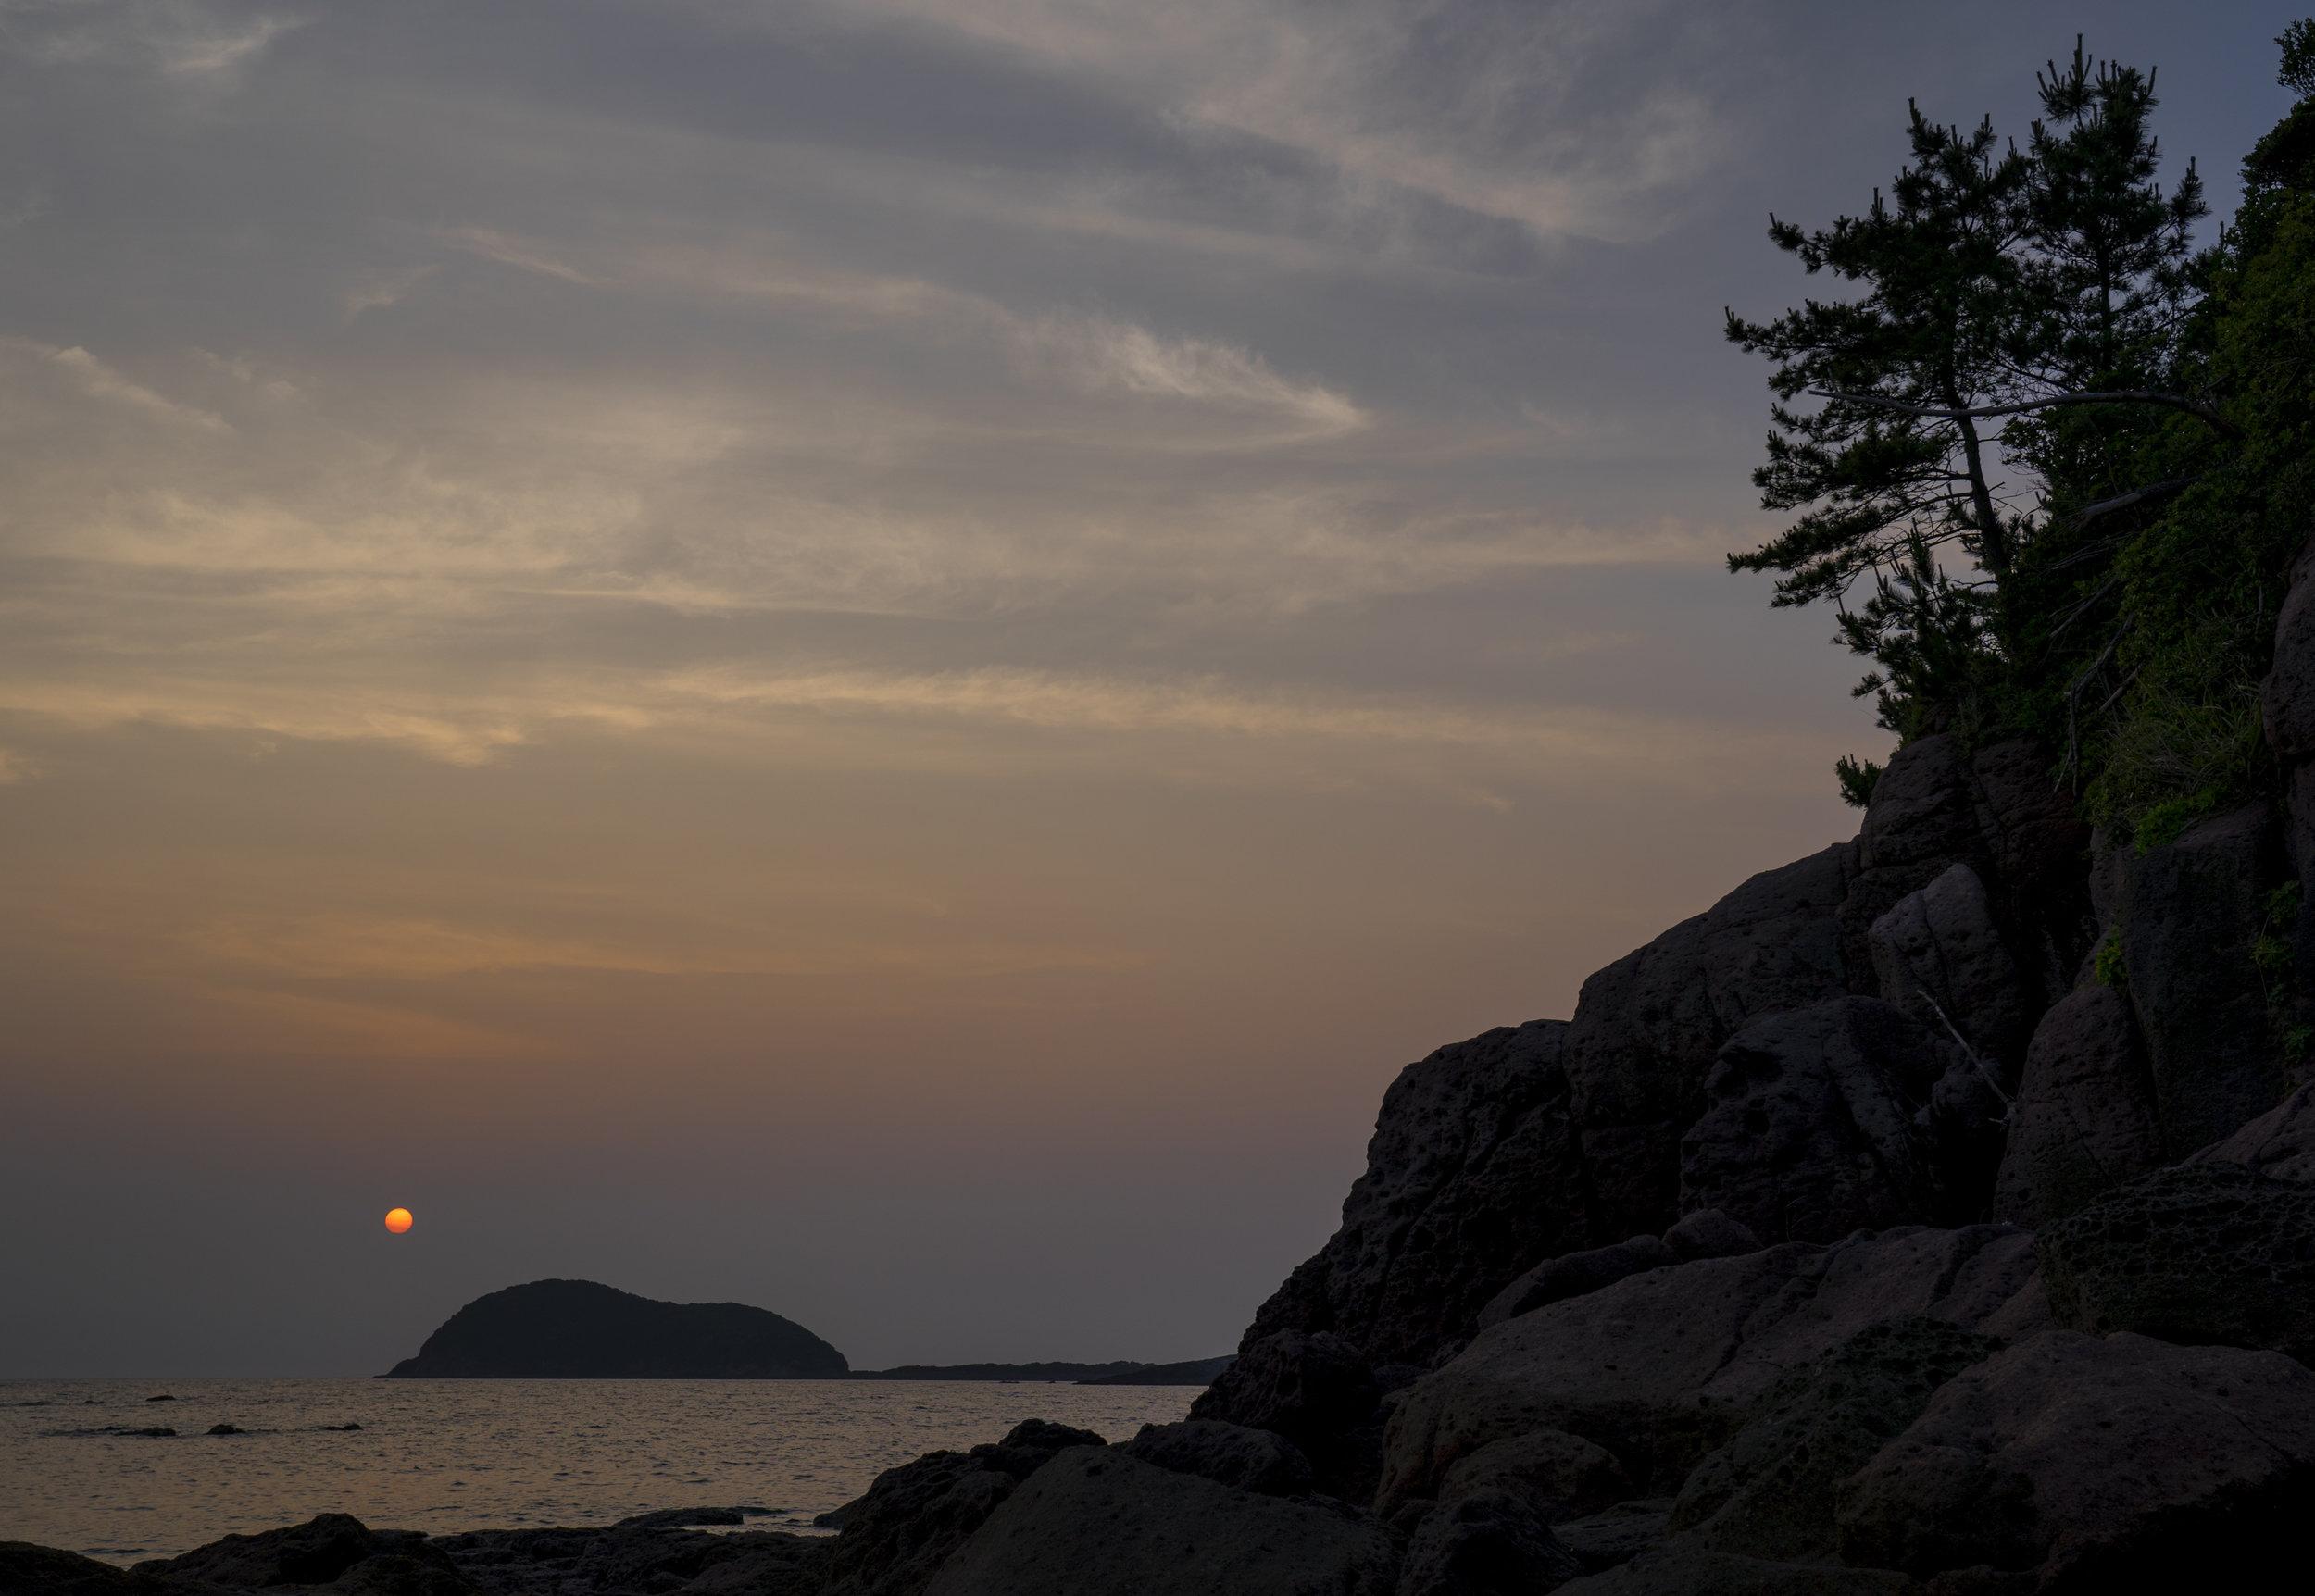 Setting sun in Kagoshima, Japan. 16th June 2019.